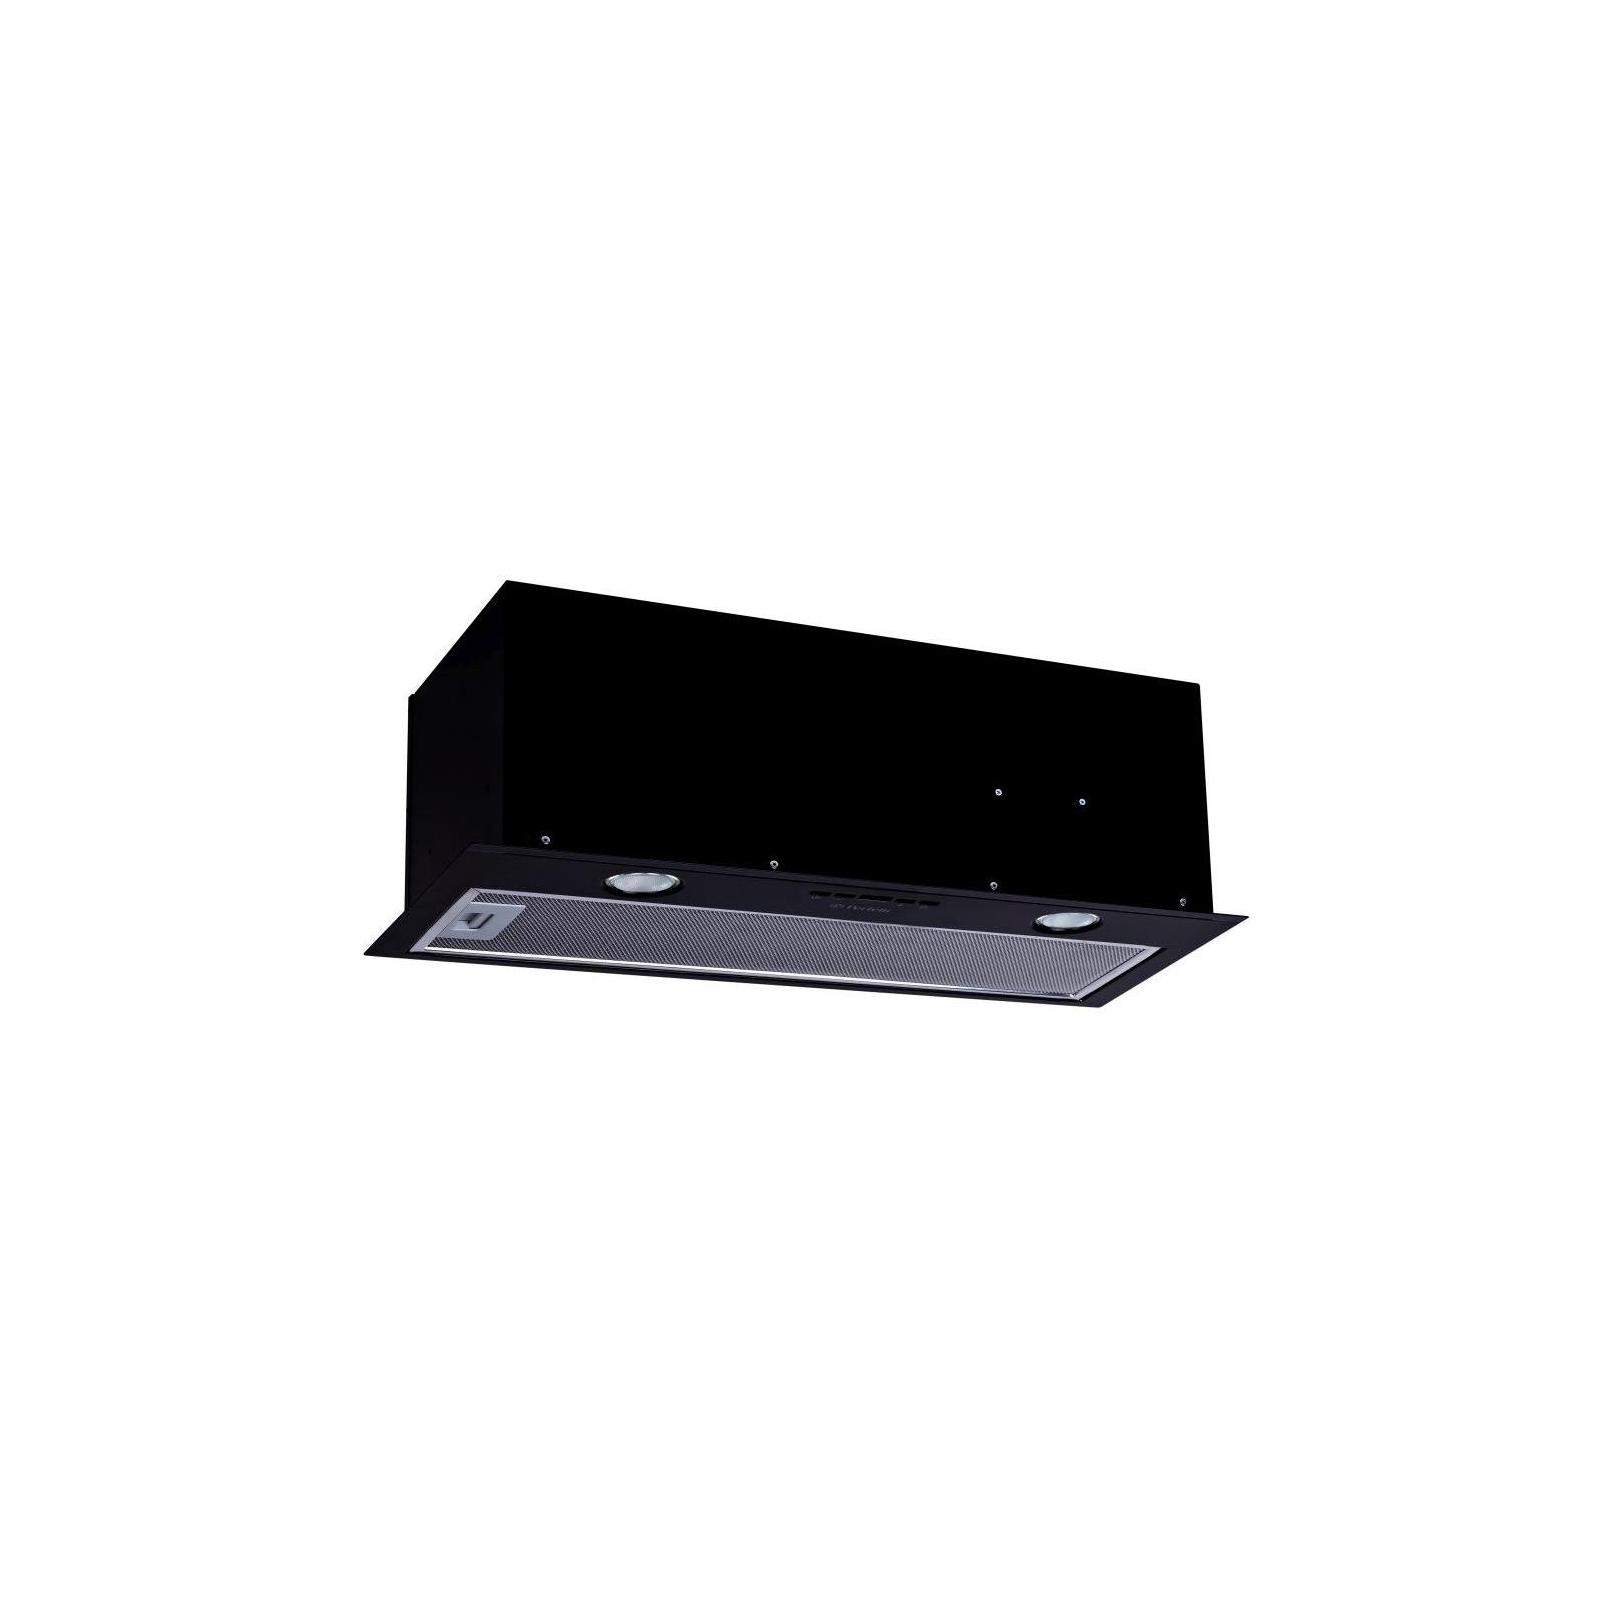 Вытяжка кухонная PERFELLI BIET 6512 A 1000 BL LED изображение 2